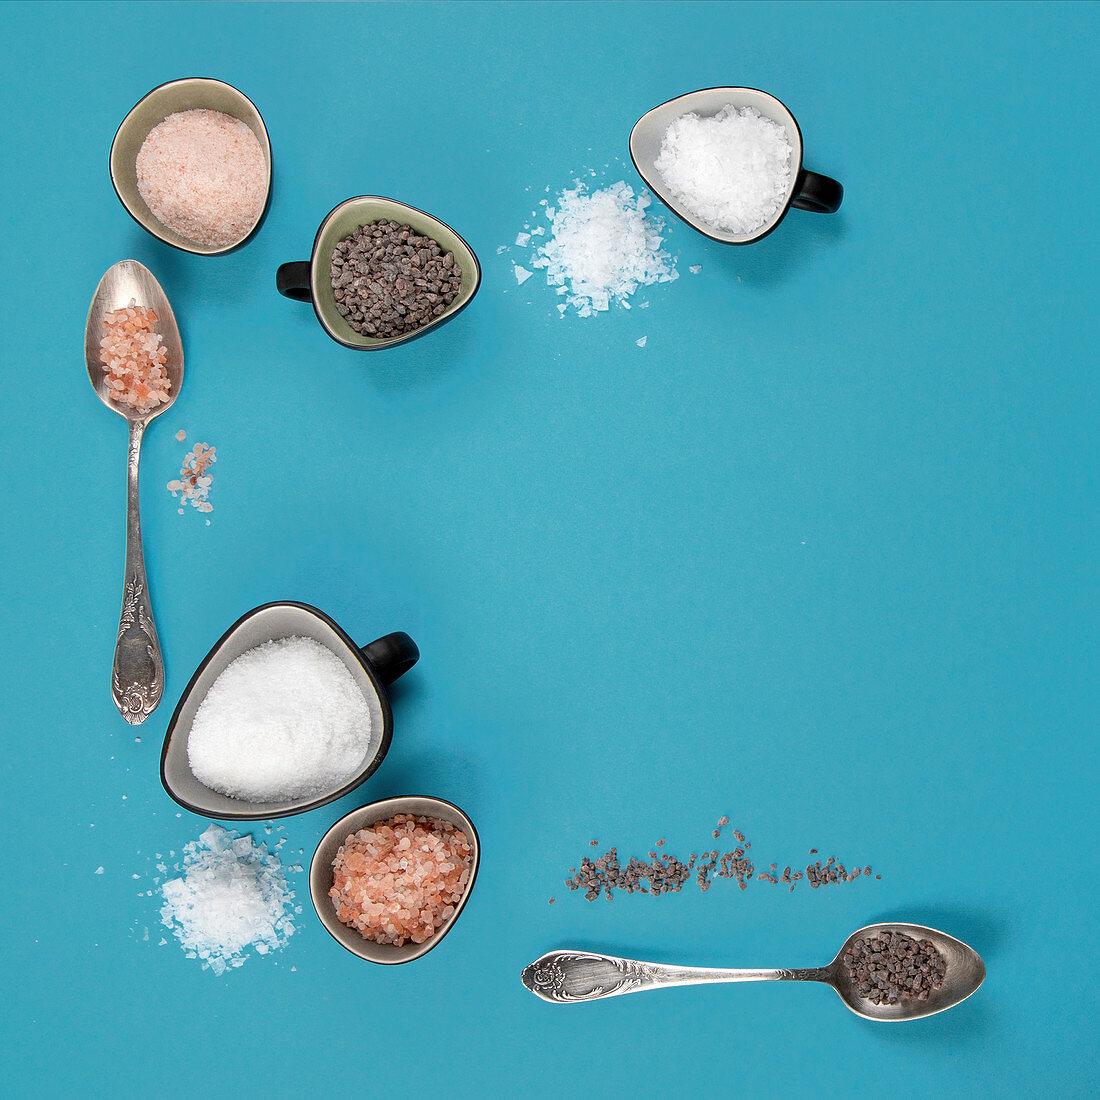 Different types of salt on blue background